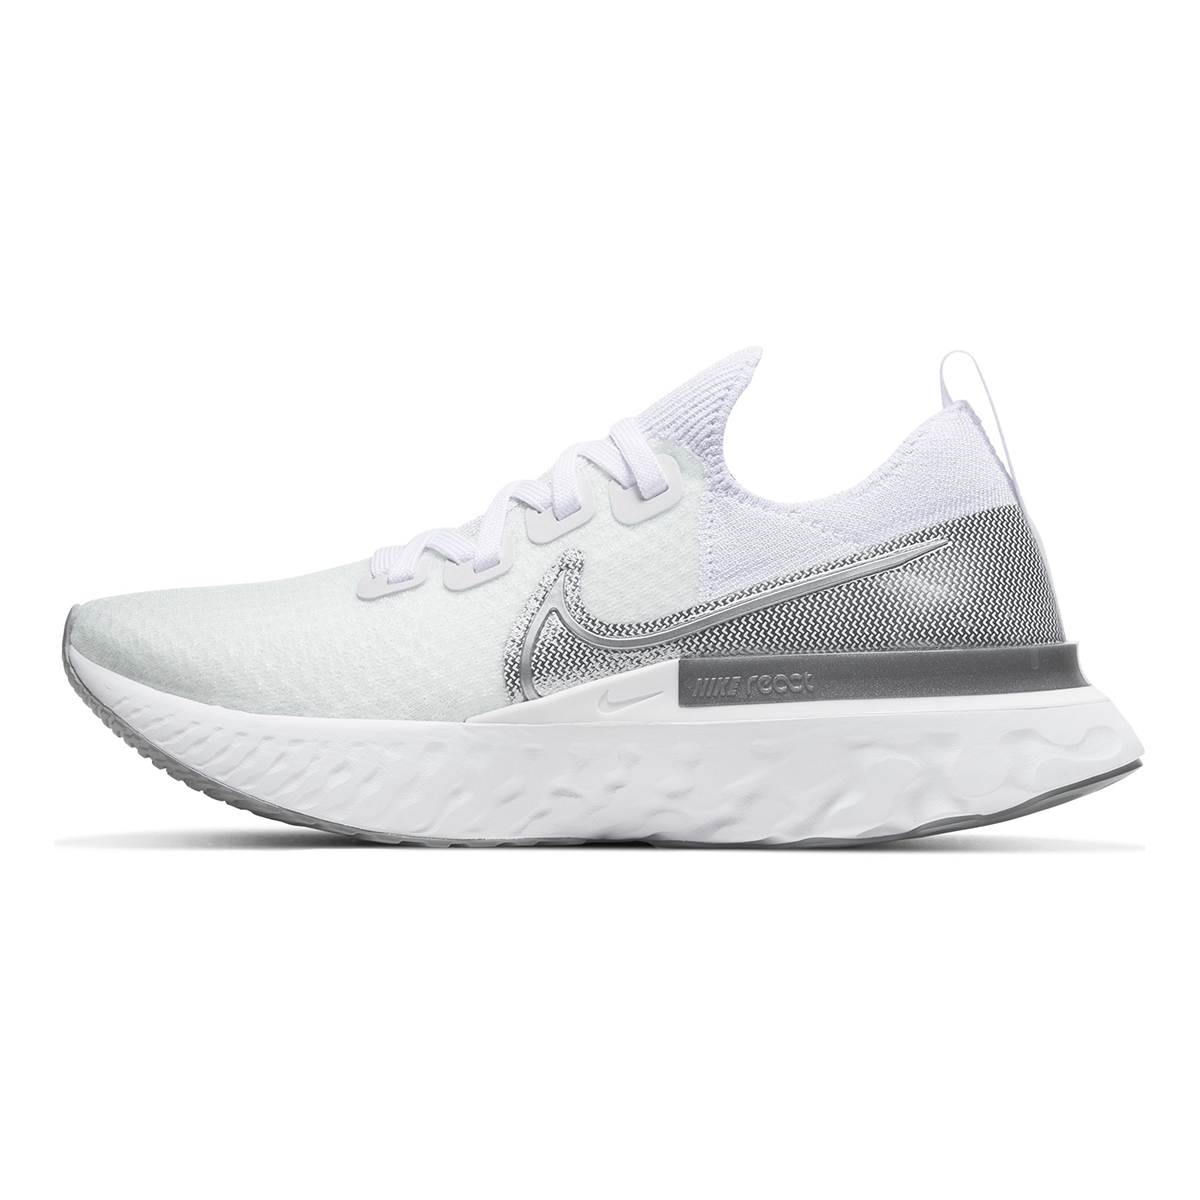 Women's Nike React Infinity Run Flyknit Running Shoe - Color: True White/White/Pure Platinum/Metallic Silver (Regular Width) - Size: 5, True White/White/Pure Platinum/Metallic Silver, large, image 2